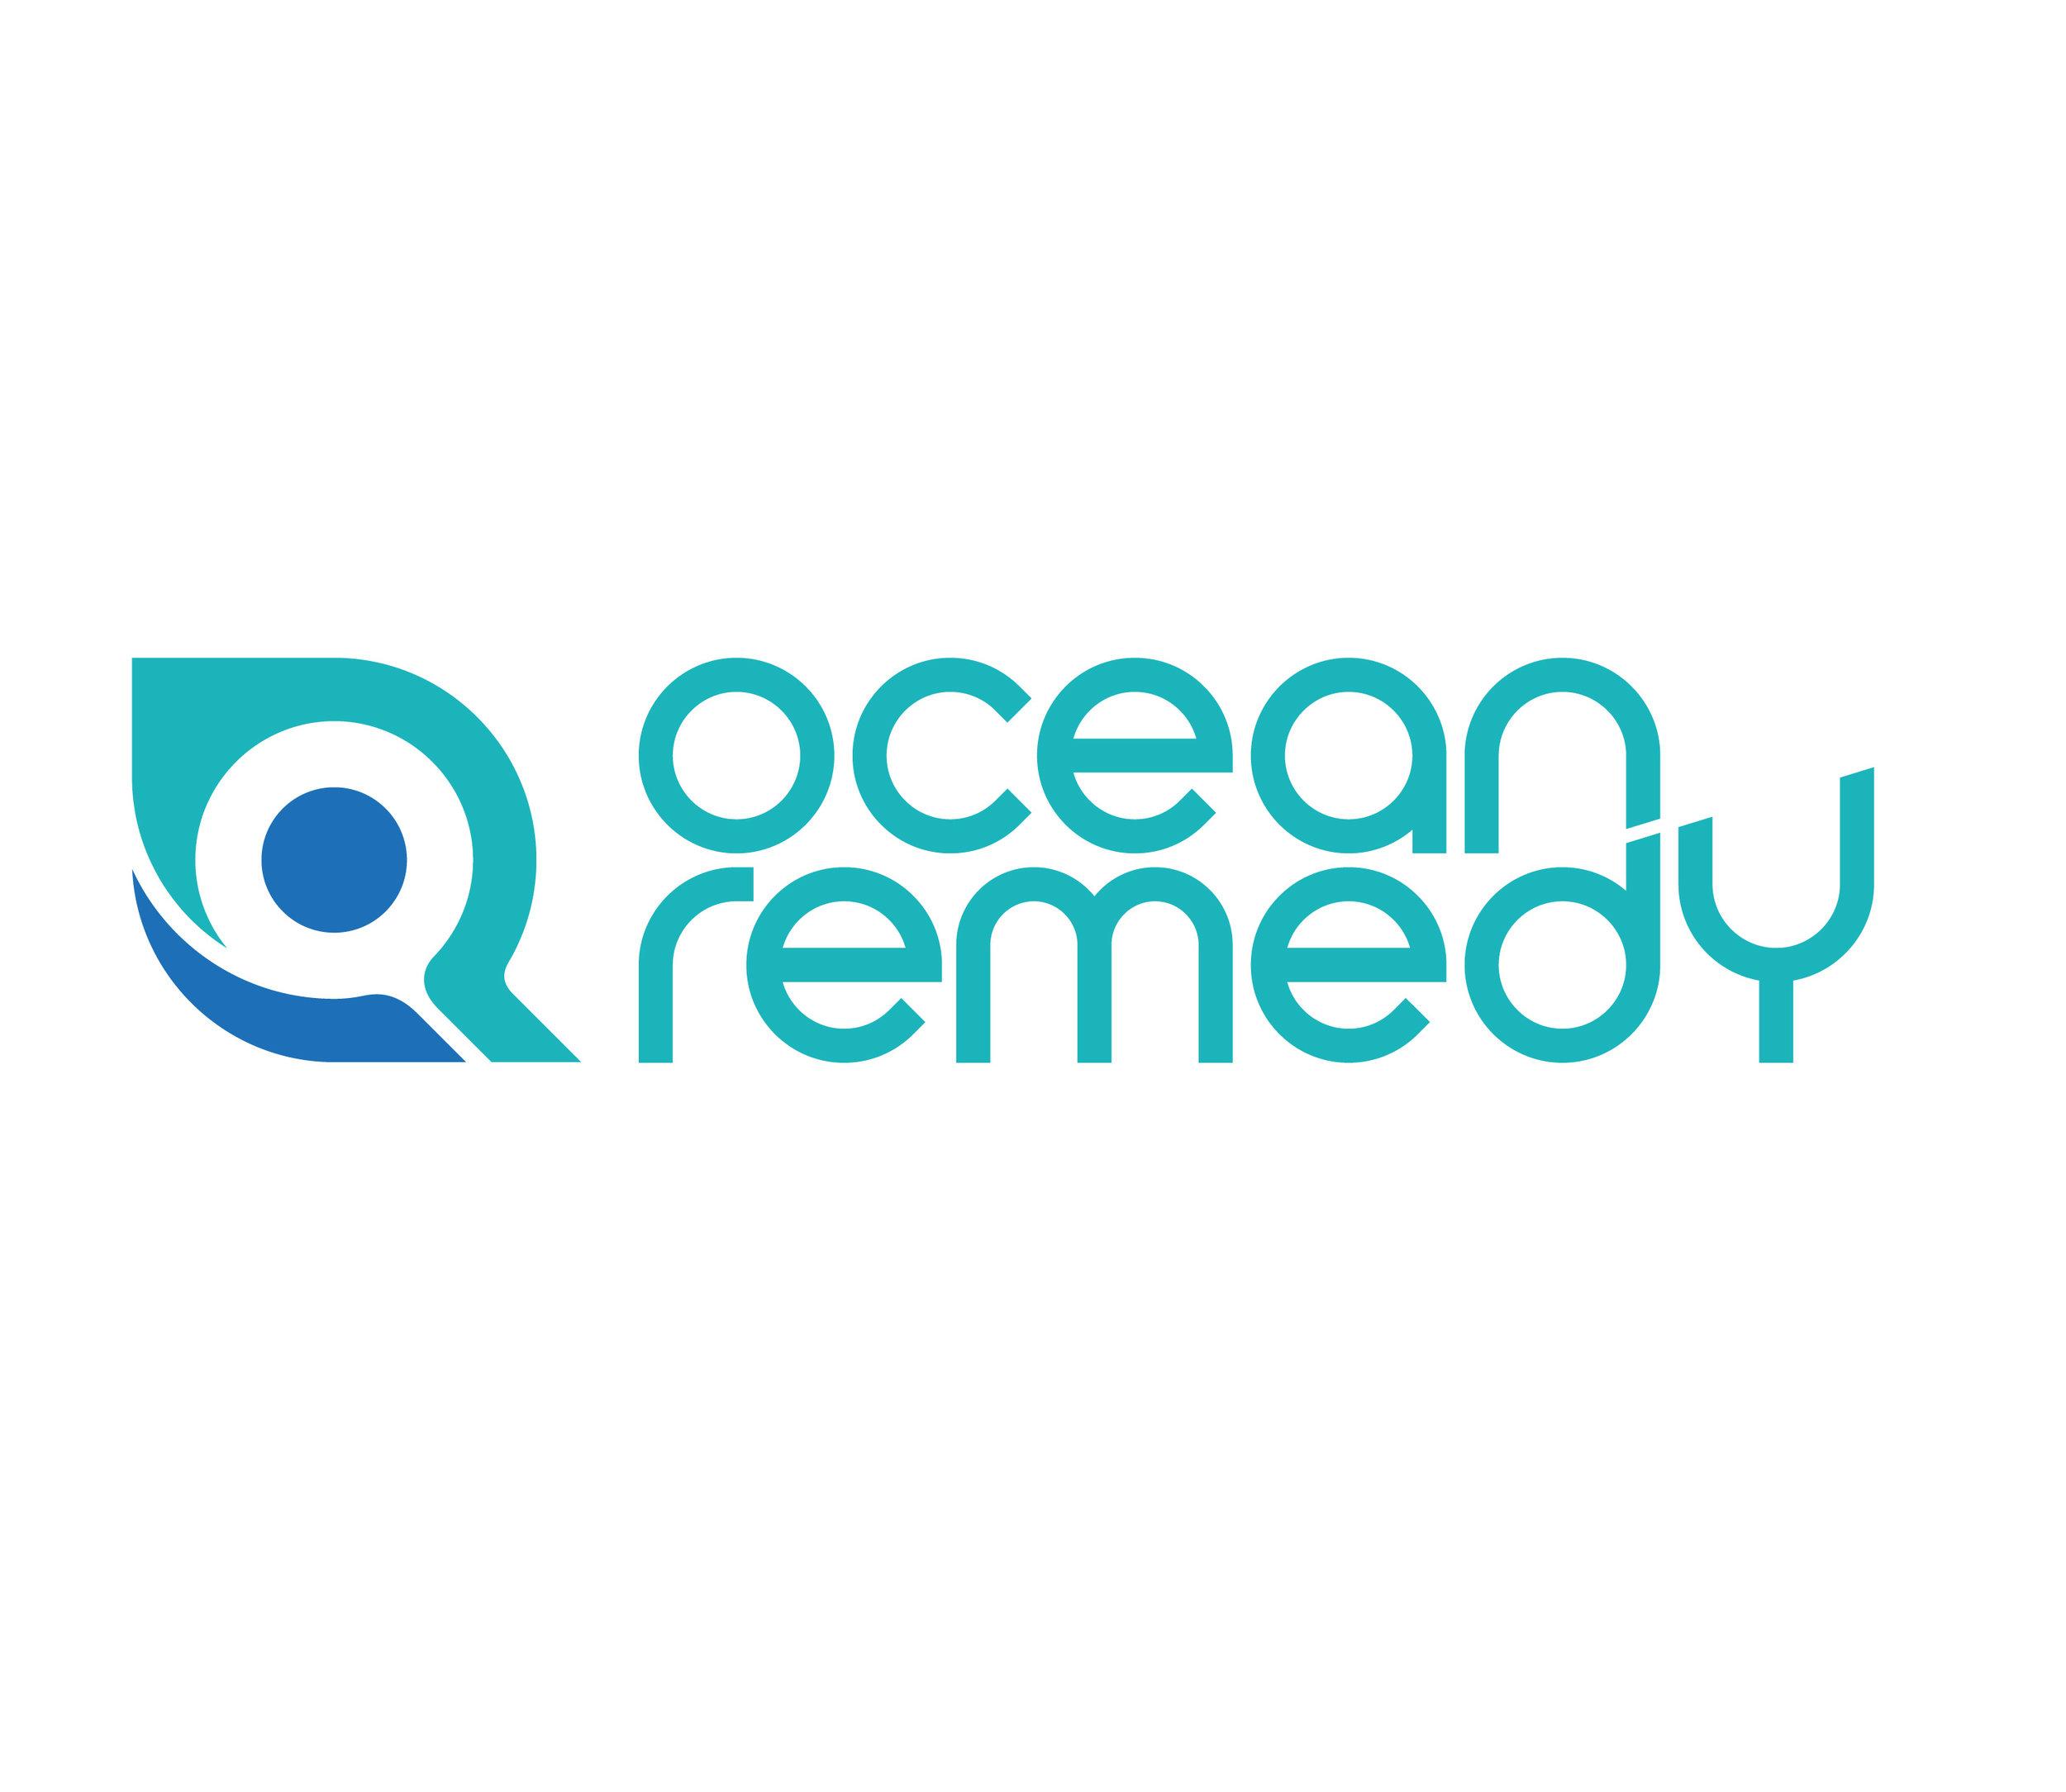 Ocean Remedy logo .jpg